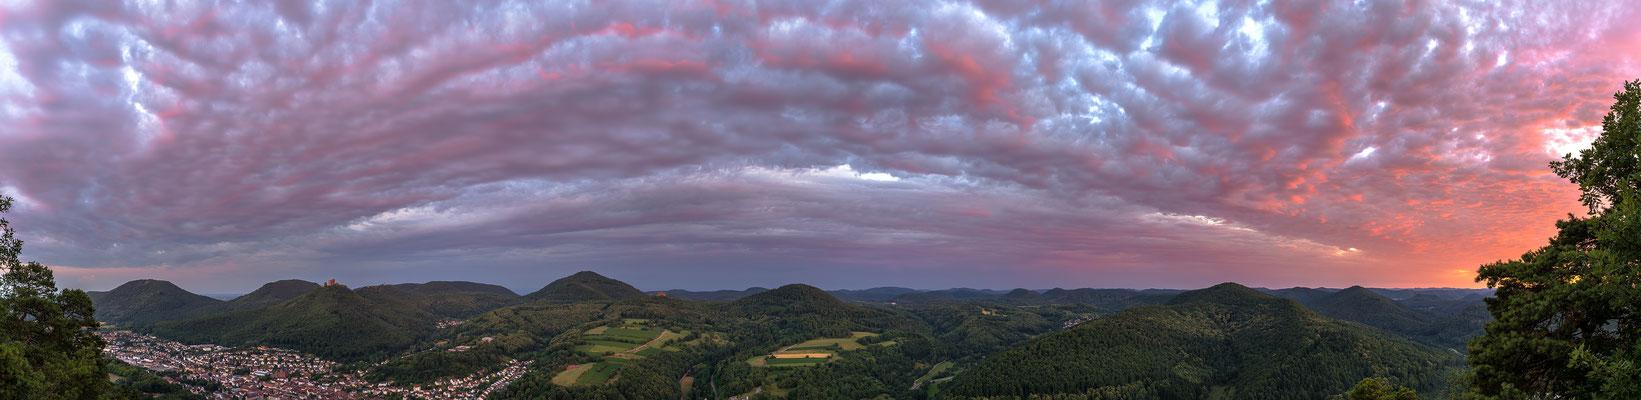 Sonnenuntergang am Sommerfels